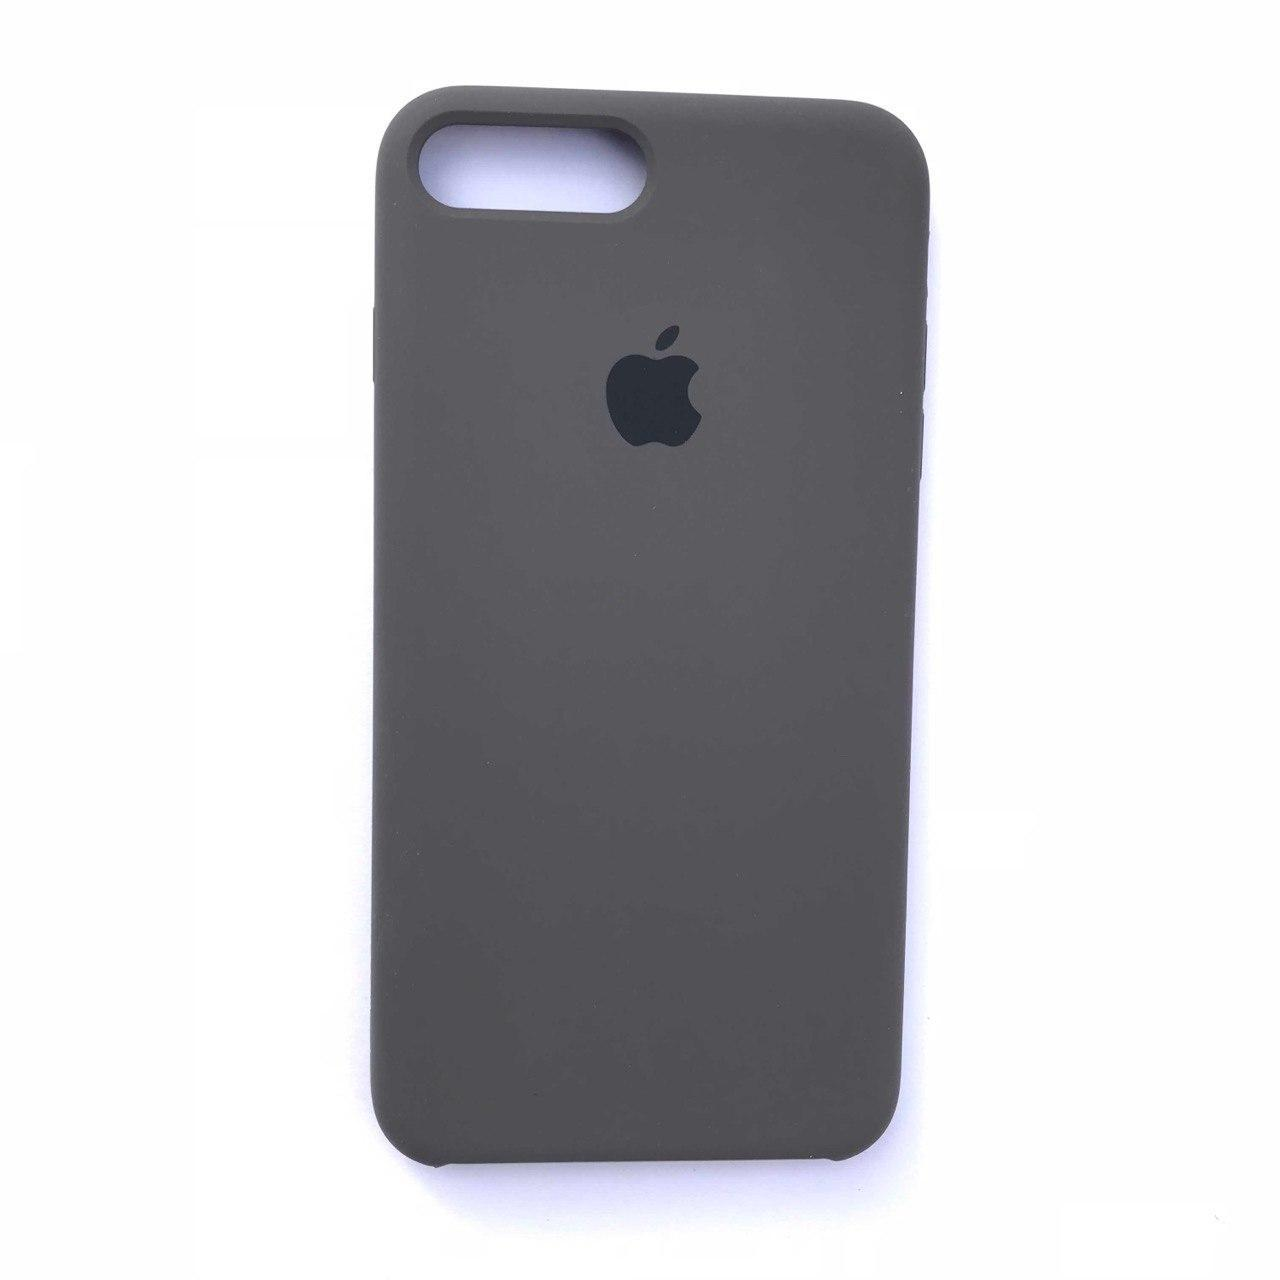 Накладка оригінальна Apple Silicone Case для iPhone 7 Plus, 8 Plus Cocoa